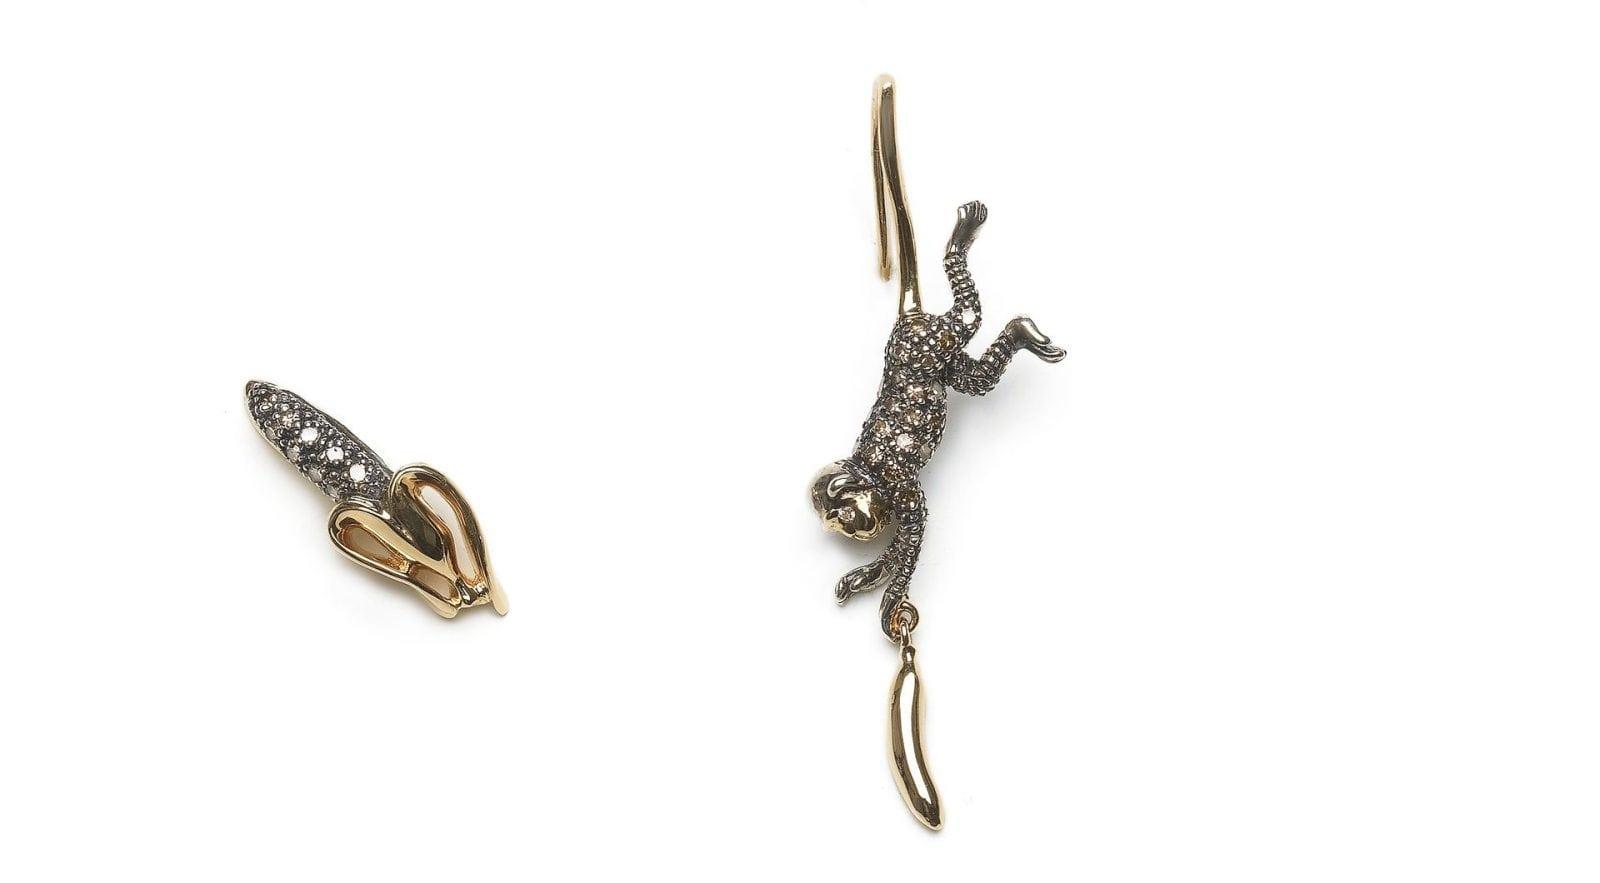 Monkey Collection Monkey and banana studs 18ct yellow gold sterling silver brown diamonds e1472213653424 - Bibi van der Velden – Bijuterii ce transcend lumea modei